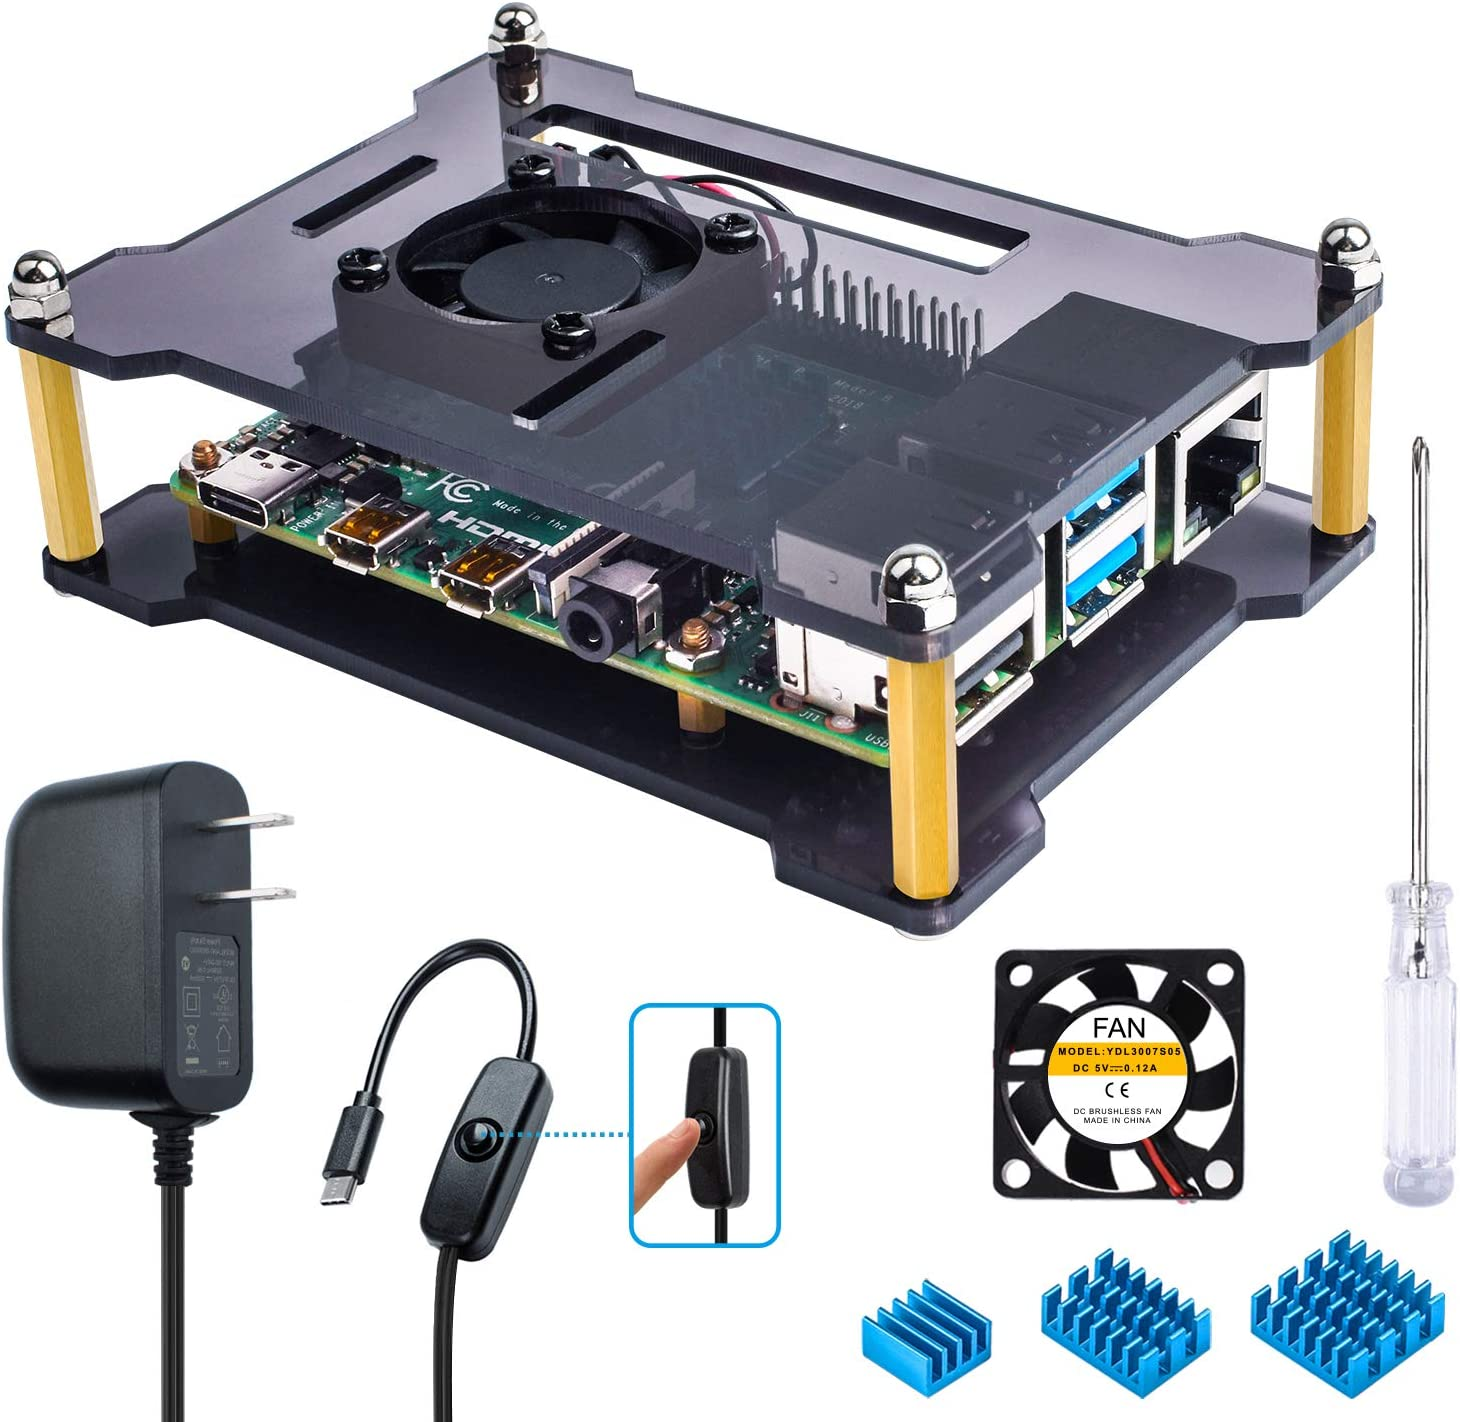 Pi 4 Board Not Included 3A Power Supply Open-Air Case for Raspberry 4 Model b // 4 B Miuzei Raspberry Pi 4 Case with Fan 3 pcs Heatsinks